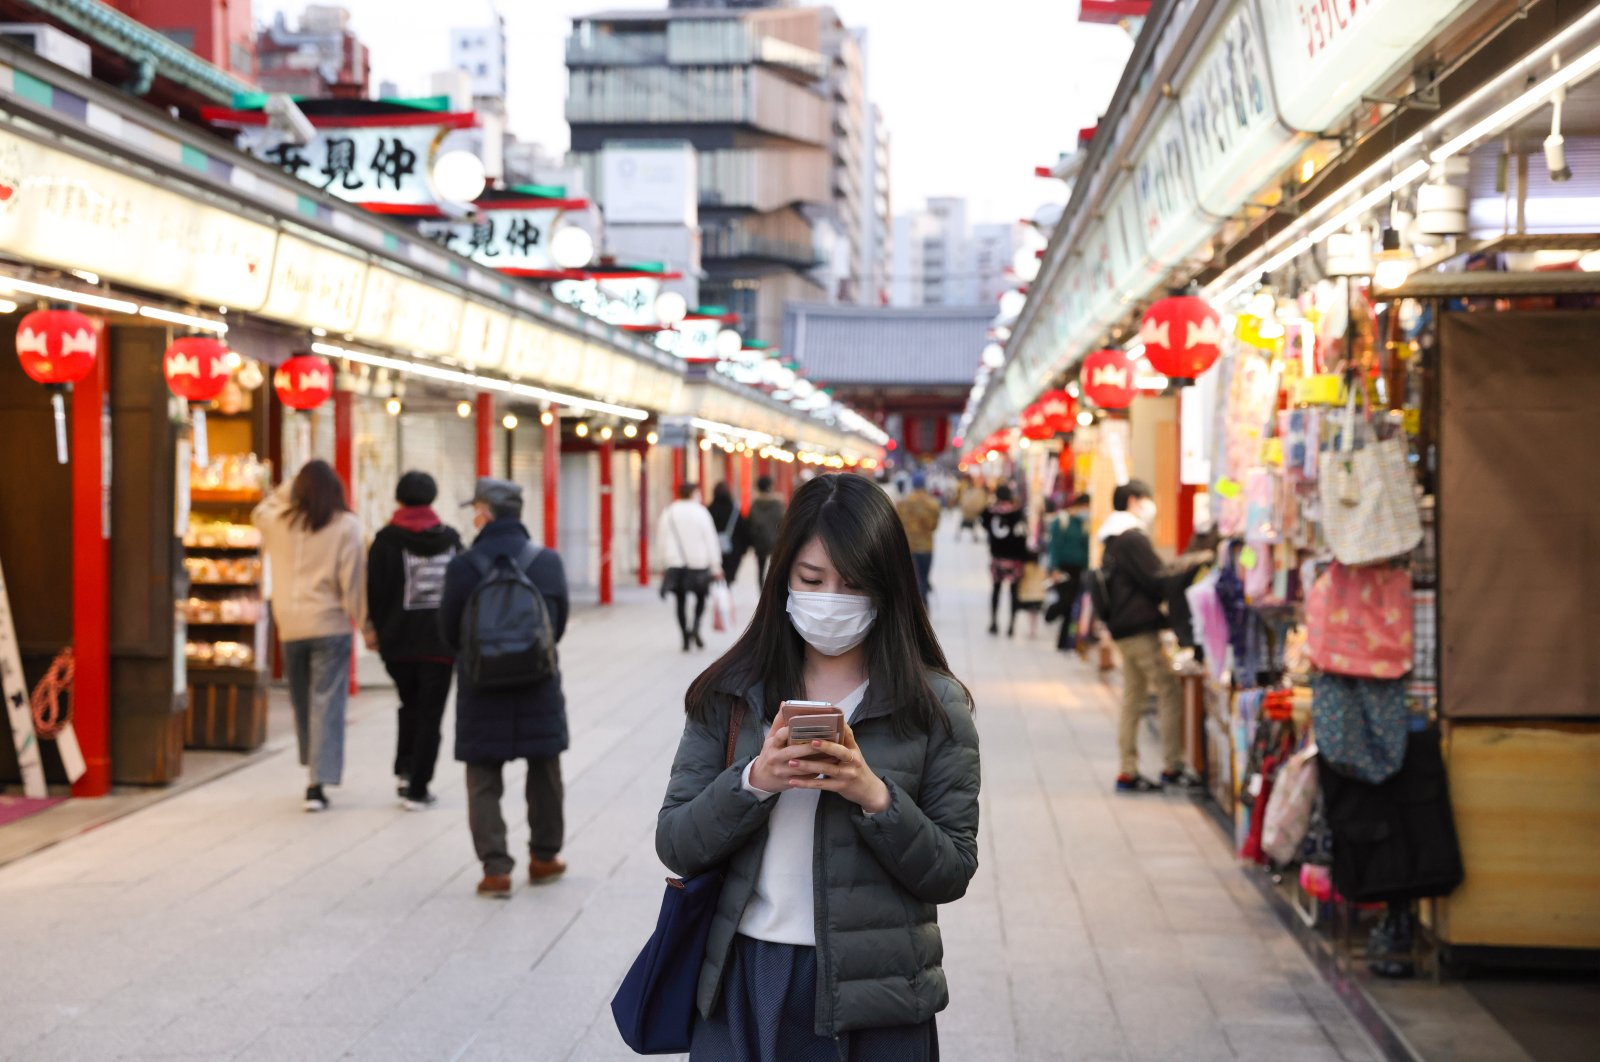 A woman wearing a mask walks through a shopping area of Asakusa Shrine, Tokyo, Japan, March 1, 2021. (Reuters Photo)